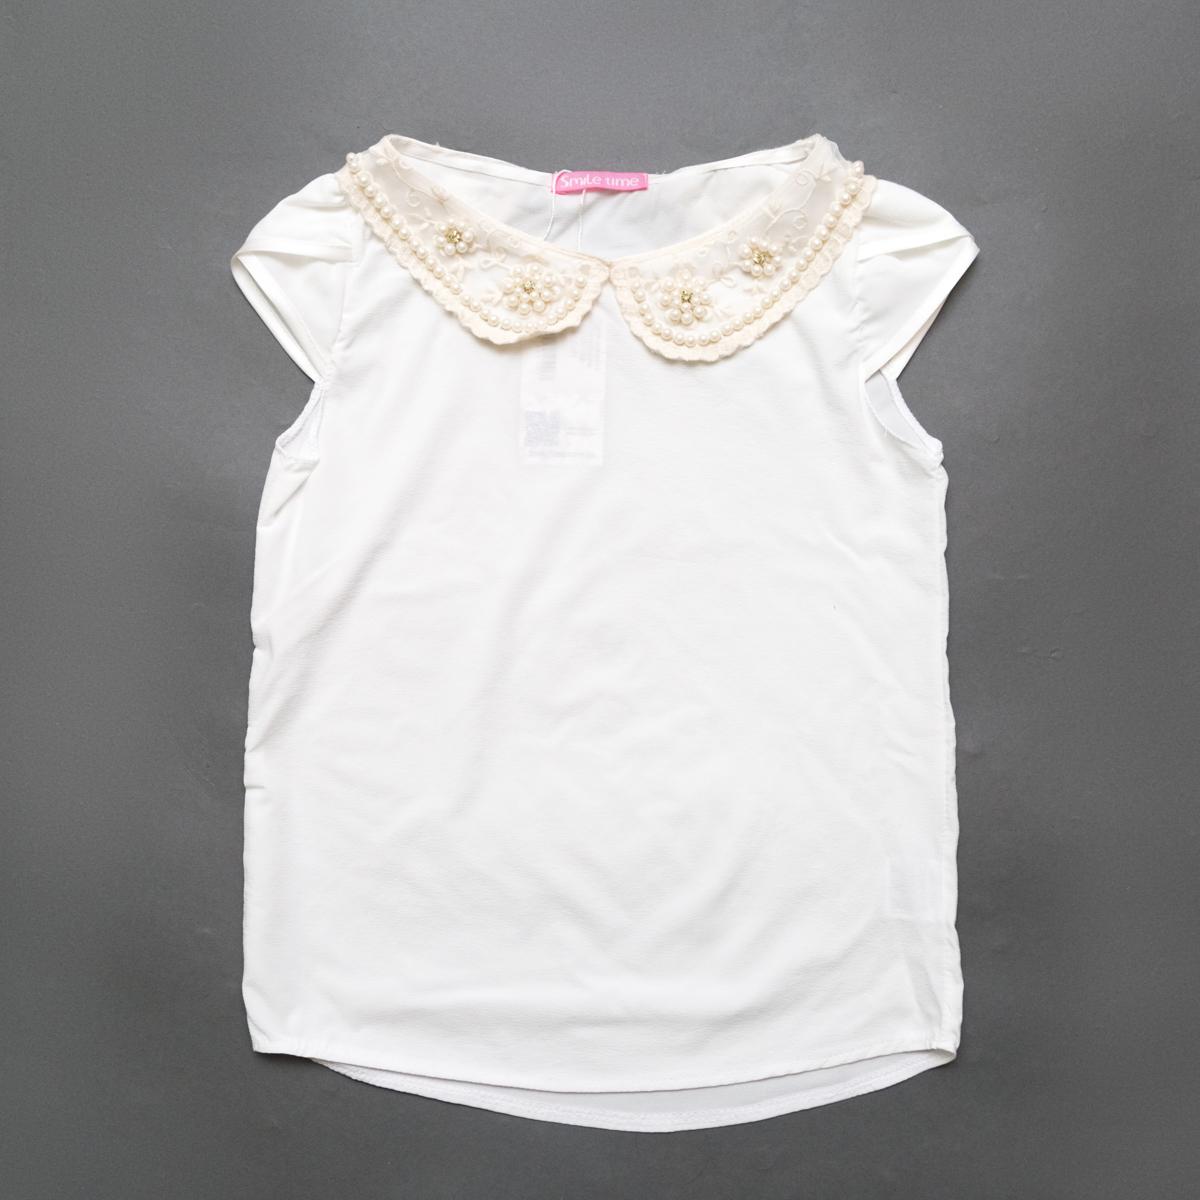 Блузка SmileTime короткий рукав Claire с воротником, молочный